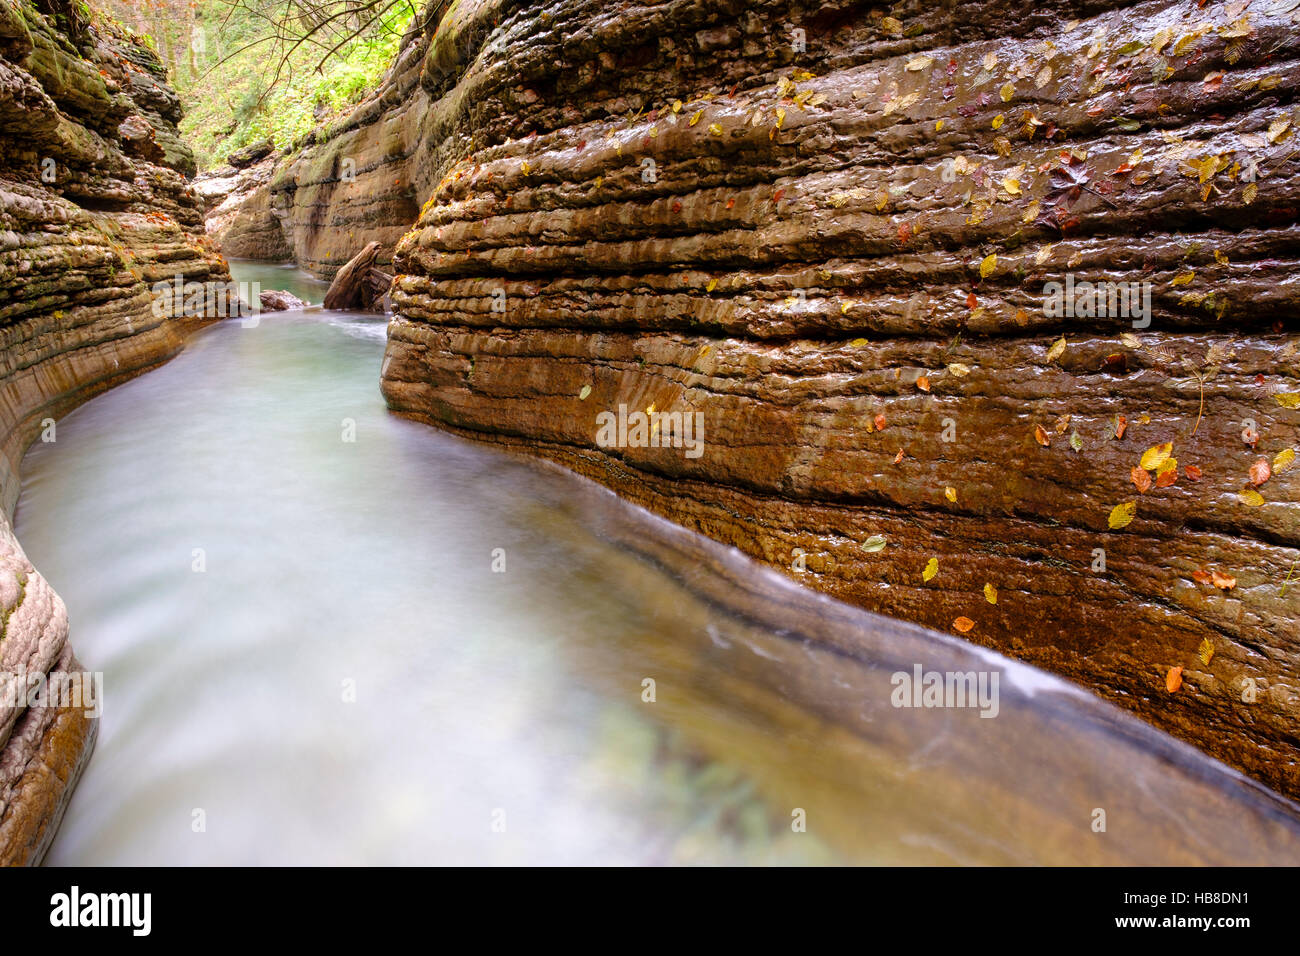 Gorge, stream, Taugl, Tauglbach, Tauglbachklamm, Hallein District, Salzburg, Austria Stock Photo